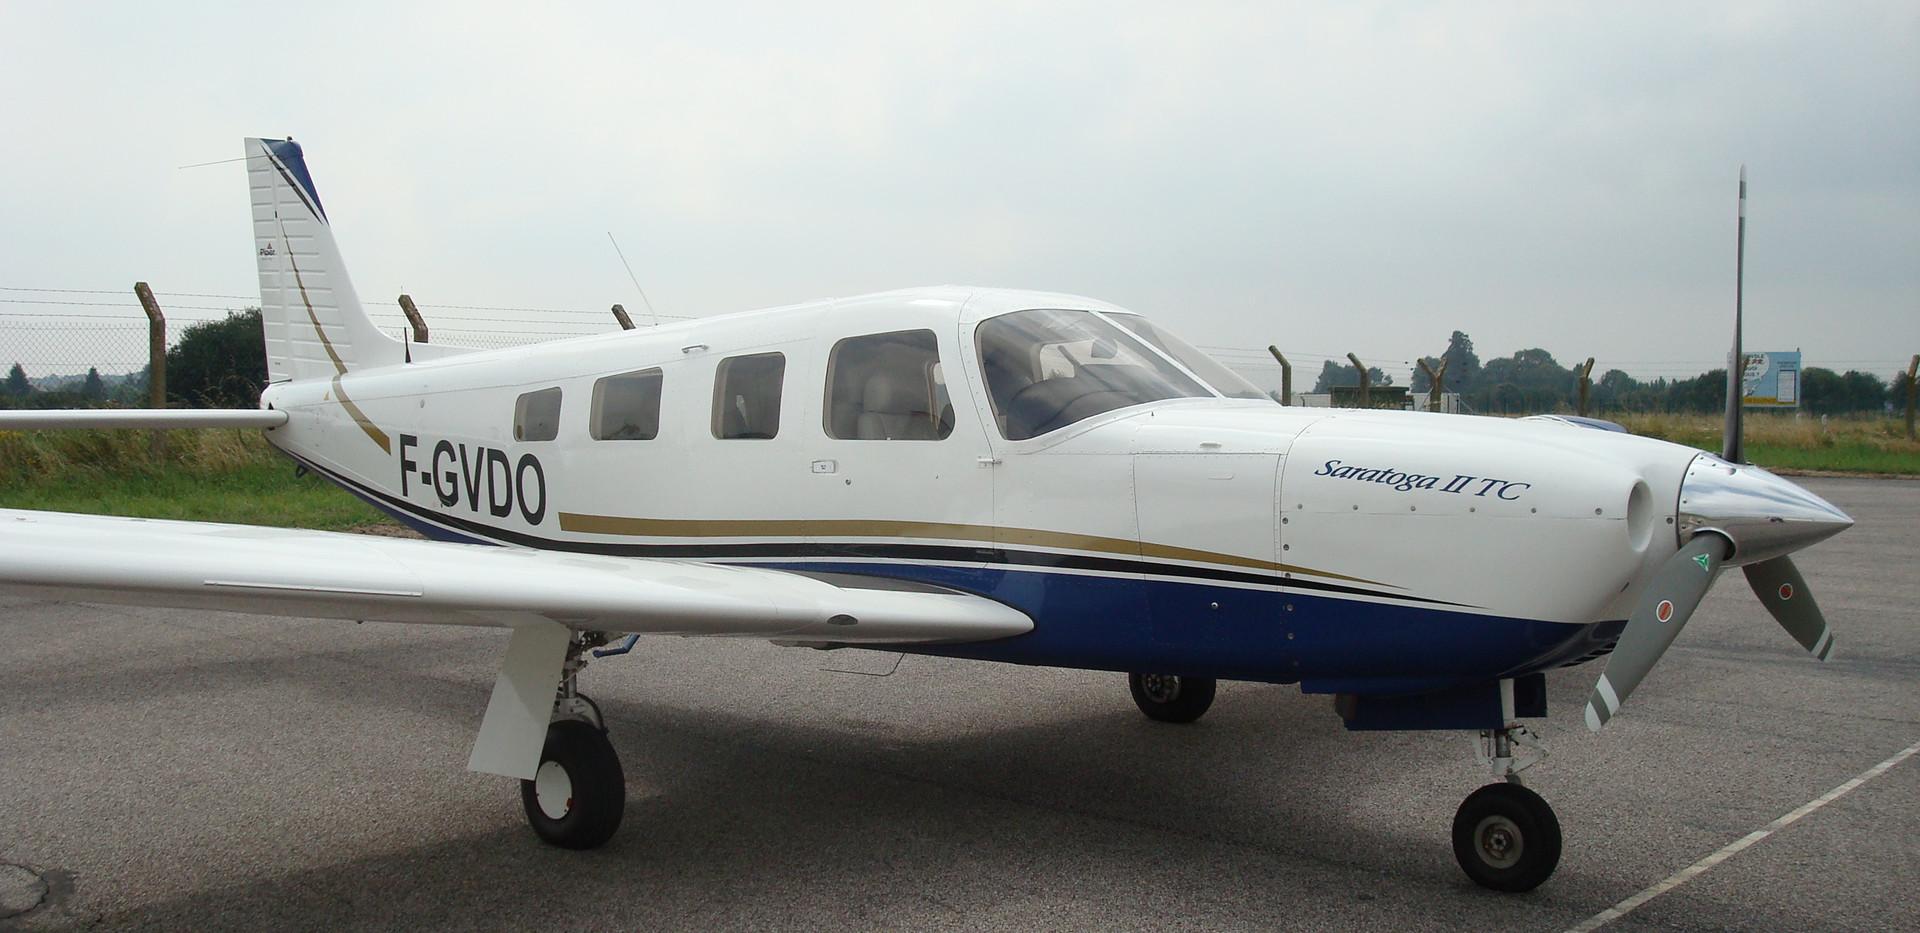 DSC02149.JPG